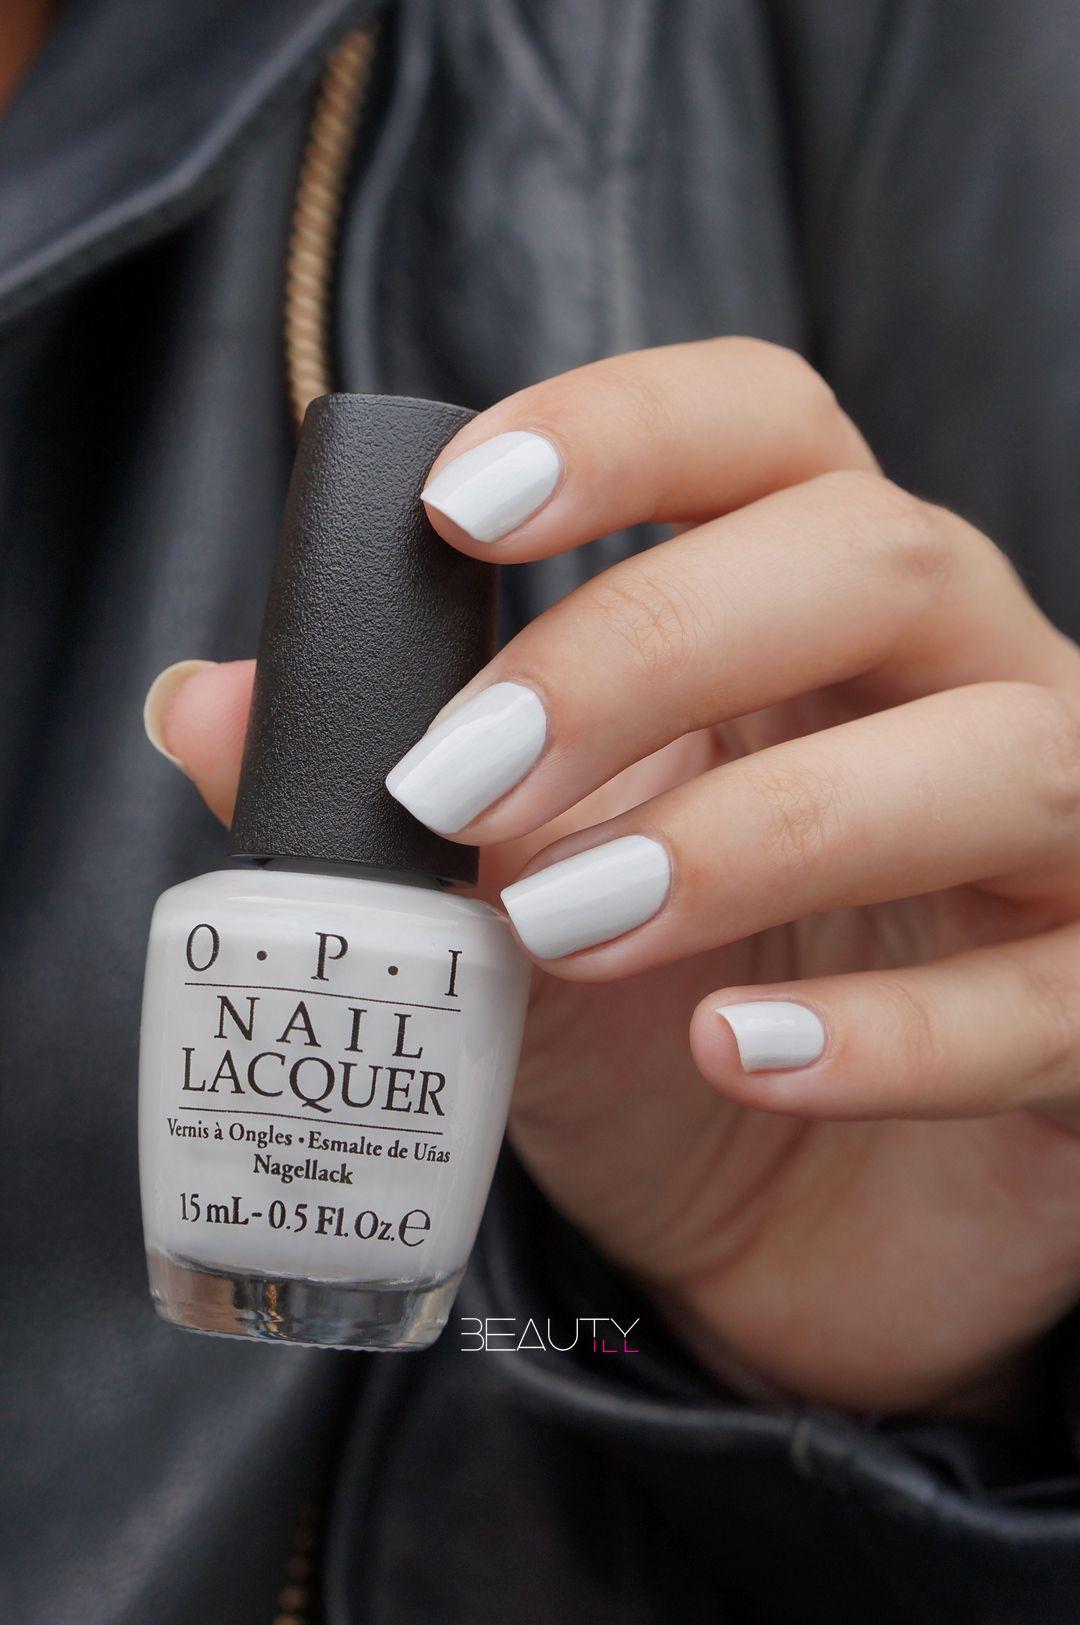 OPI Fall 2015 Venice Collection - I Cannoli Wear OPI | Beauty ...